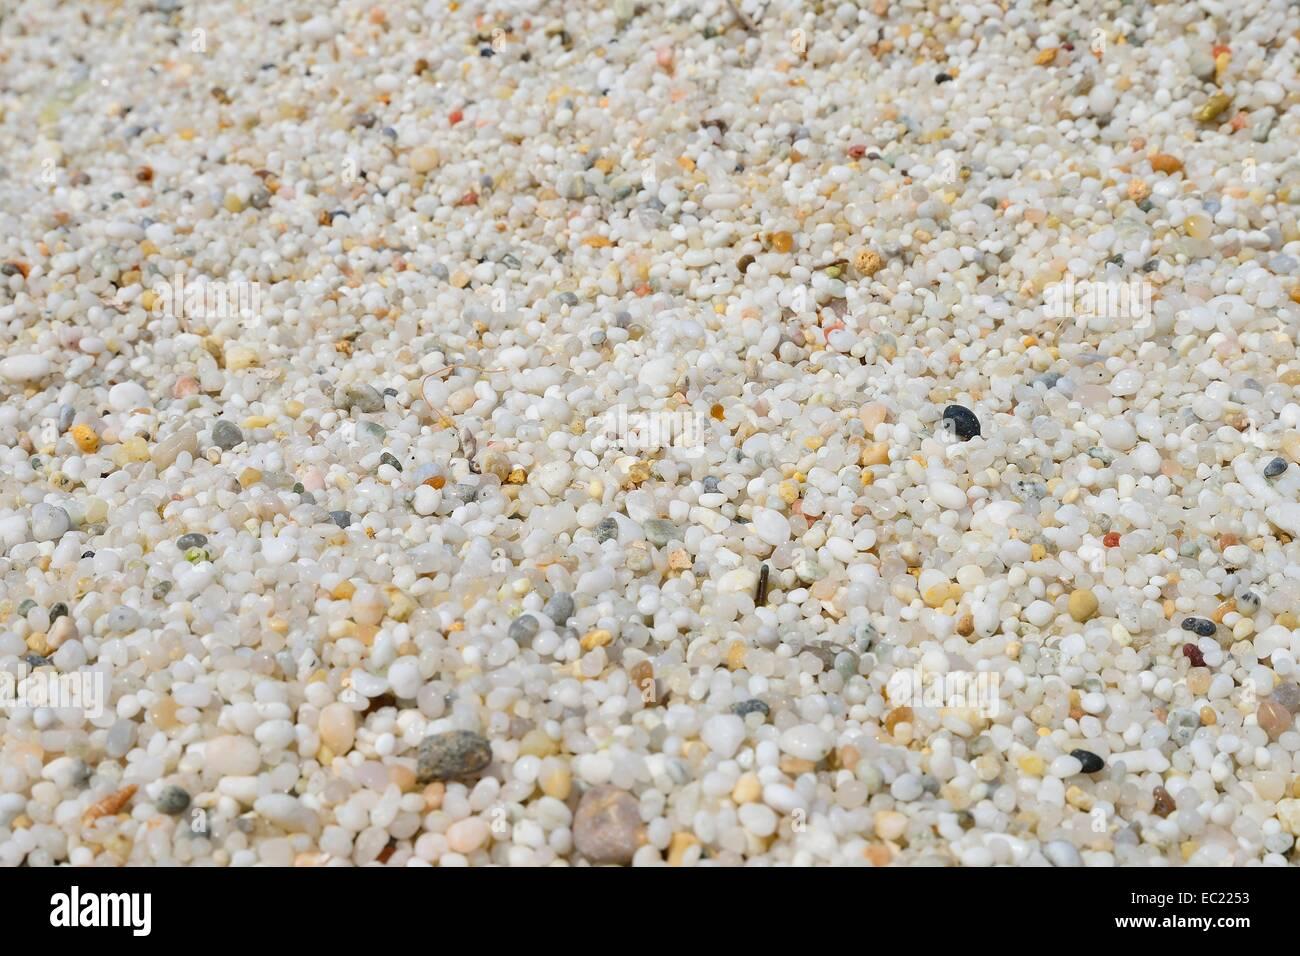 Quartz sand in rice size on Is Arutas beach. Sinis peninsula Stock Photo: 76262959 - Alamy